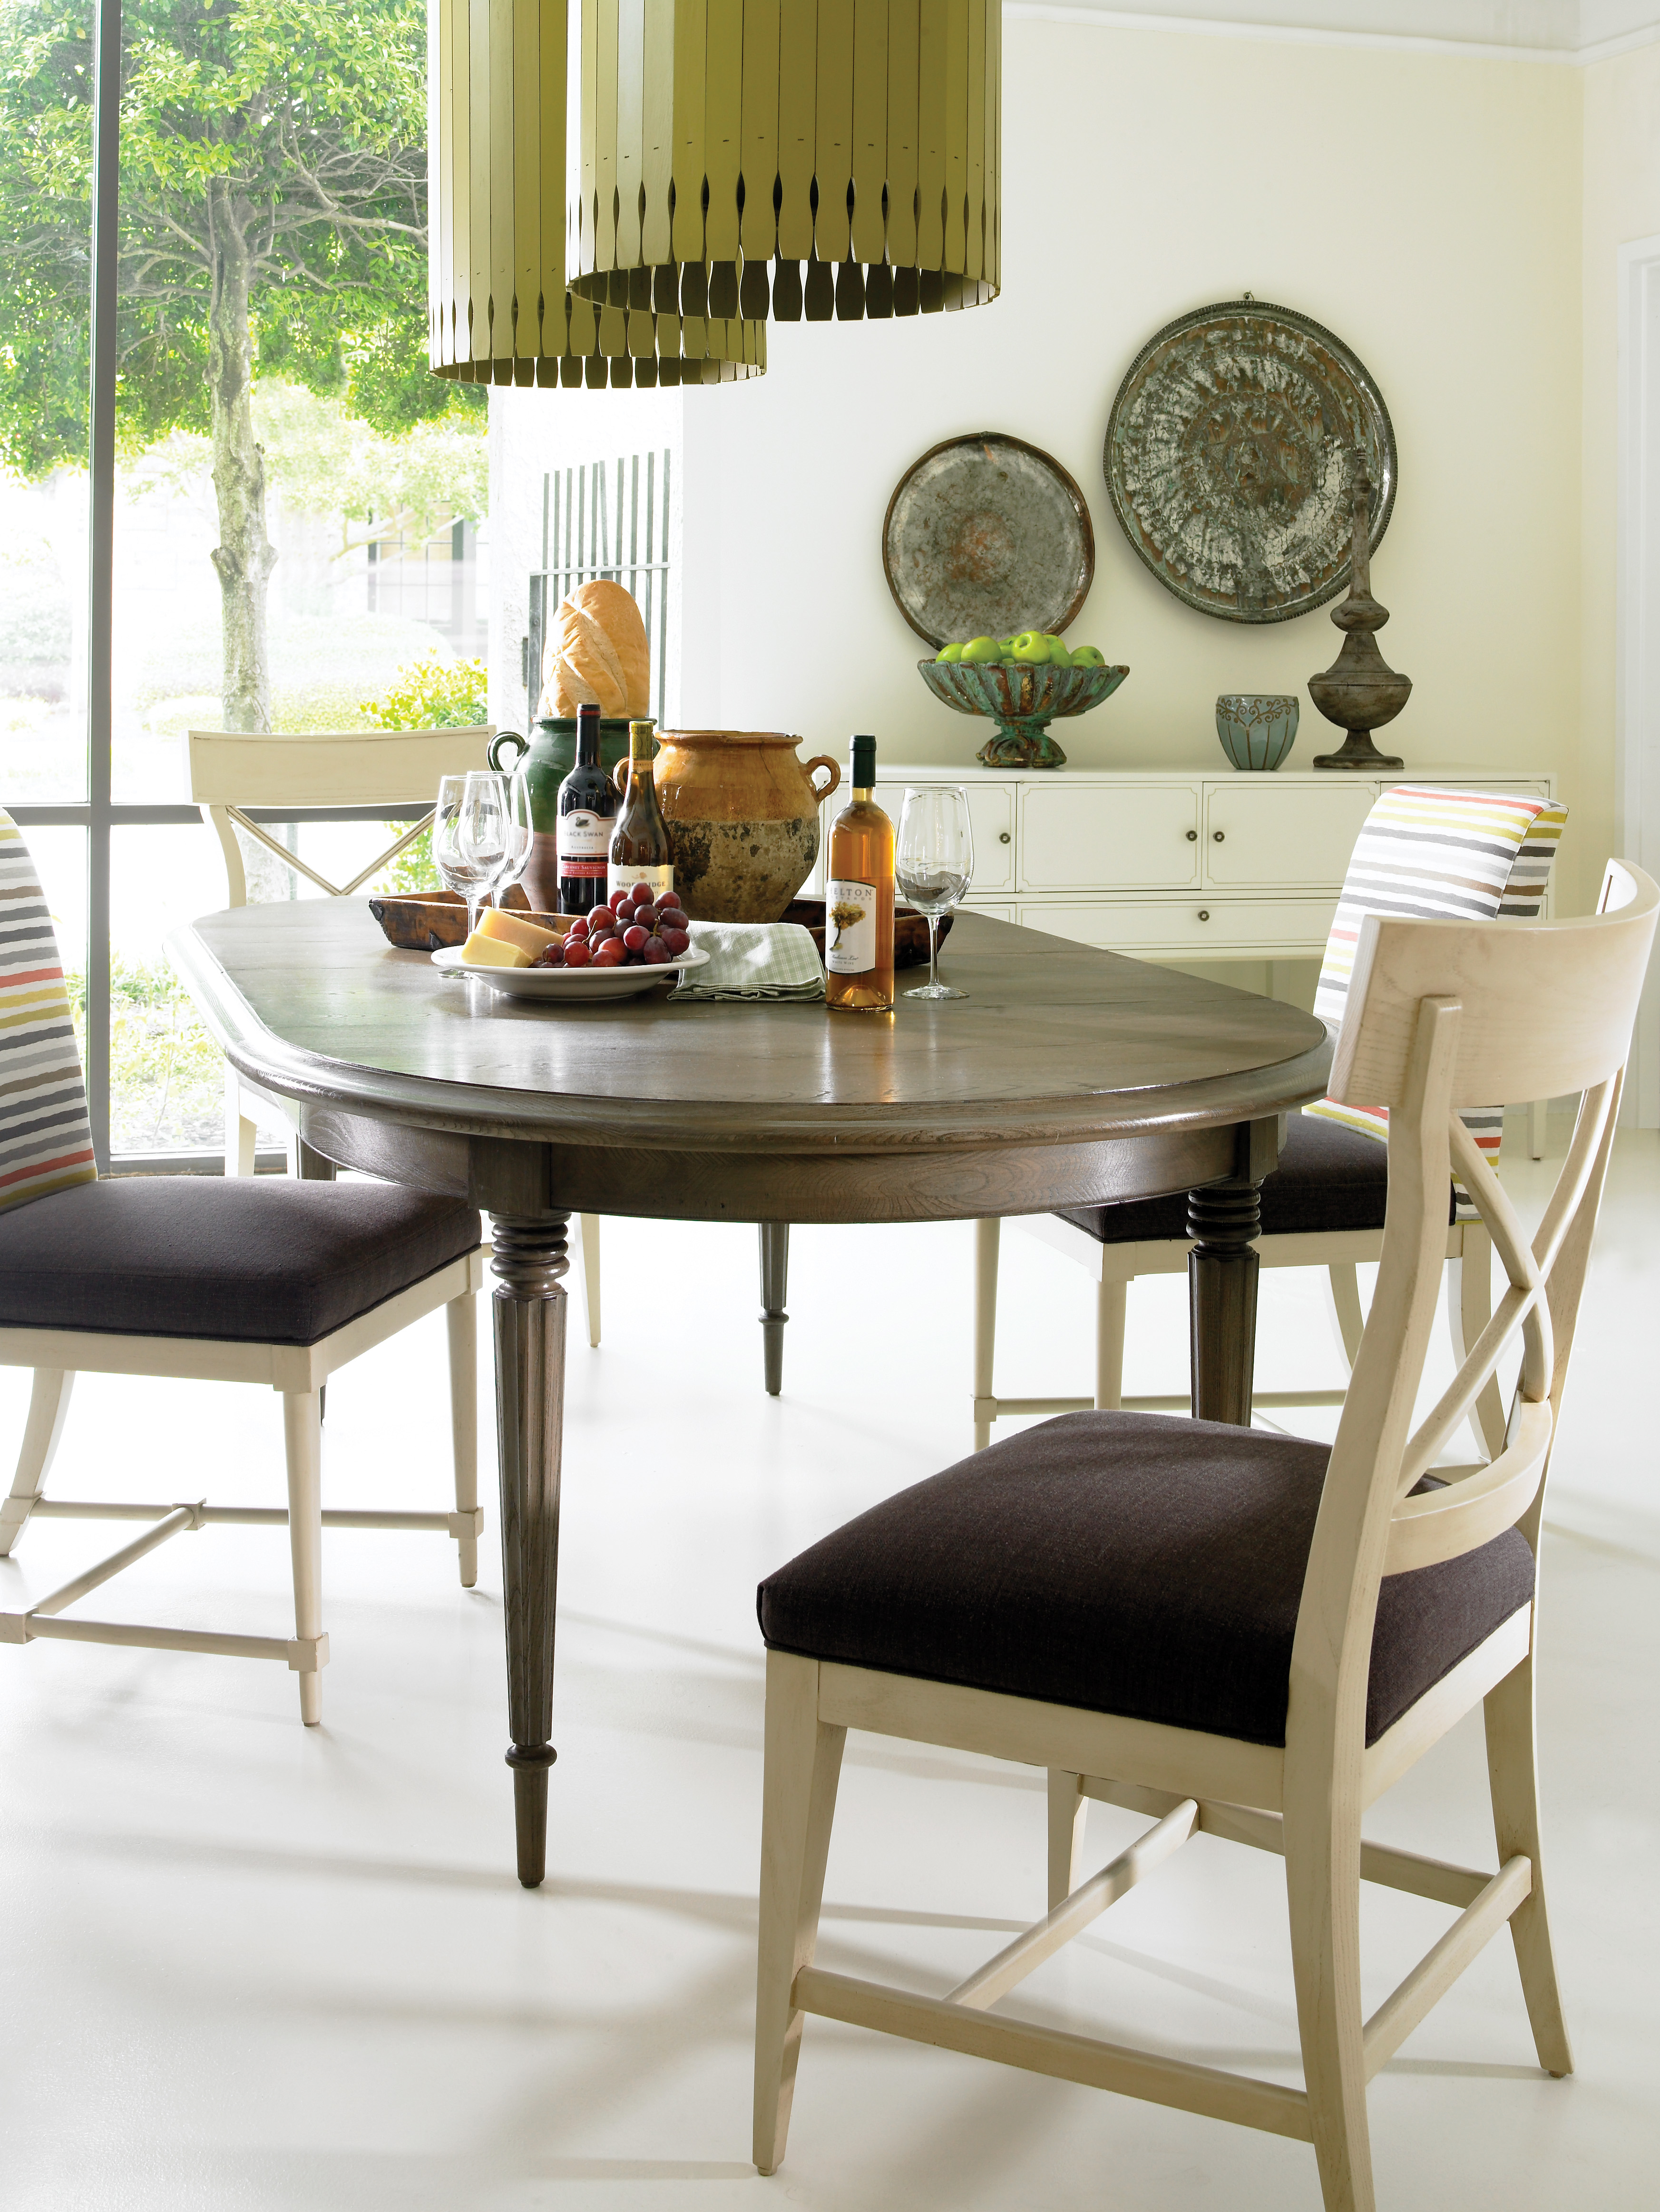 Room Settings Make It Yours Vanguard Furniture